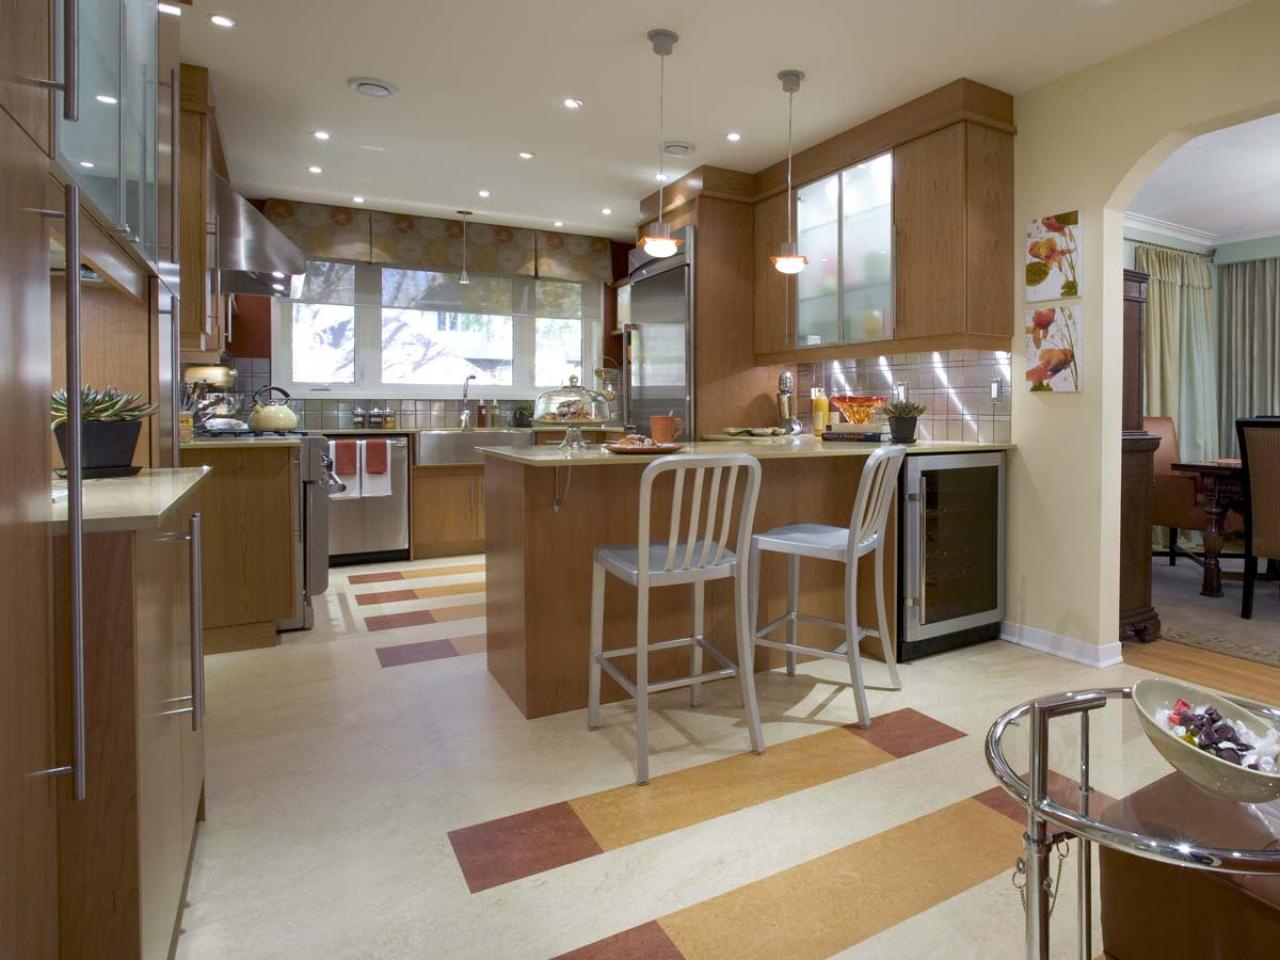 candice olson kitchen layouts photo - 7